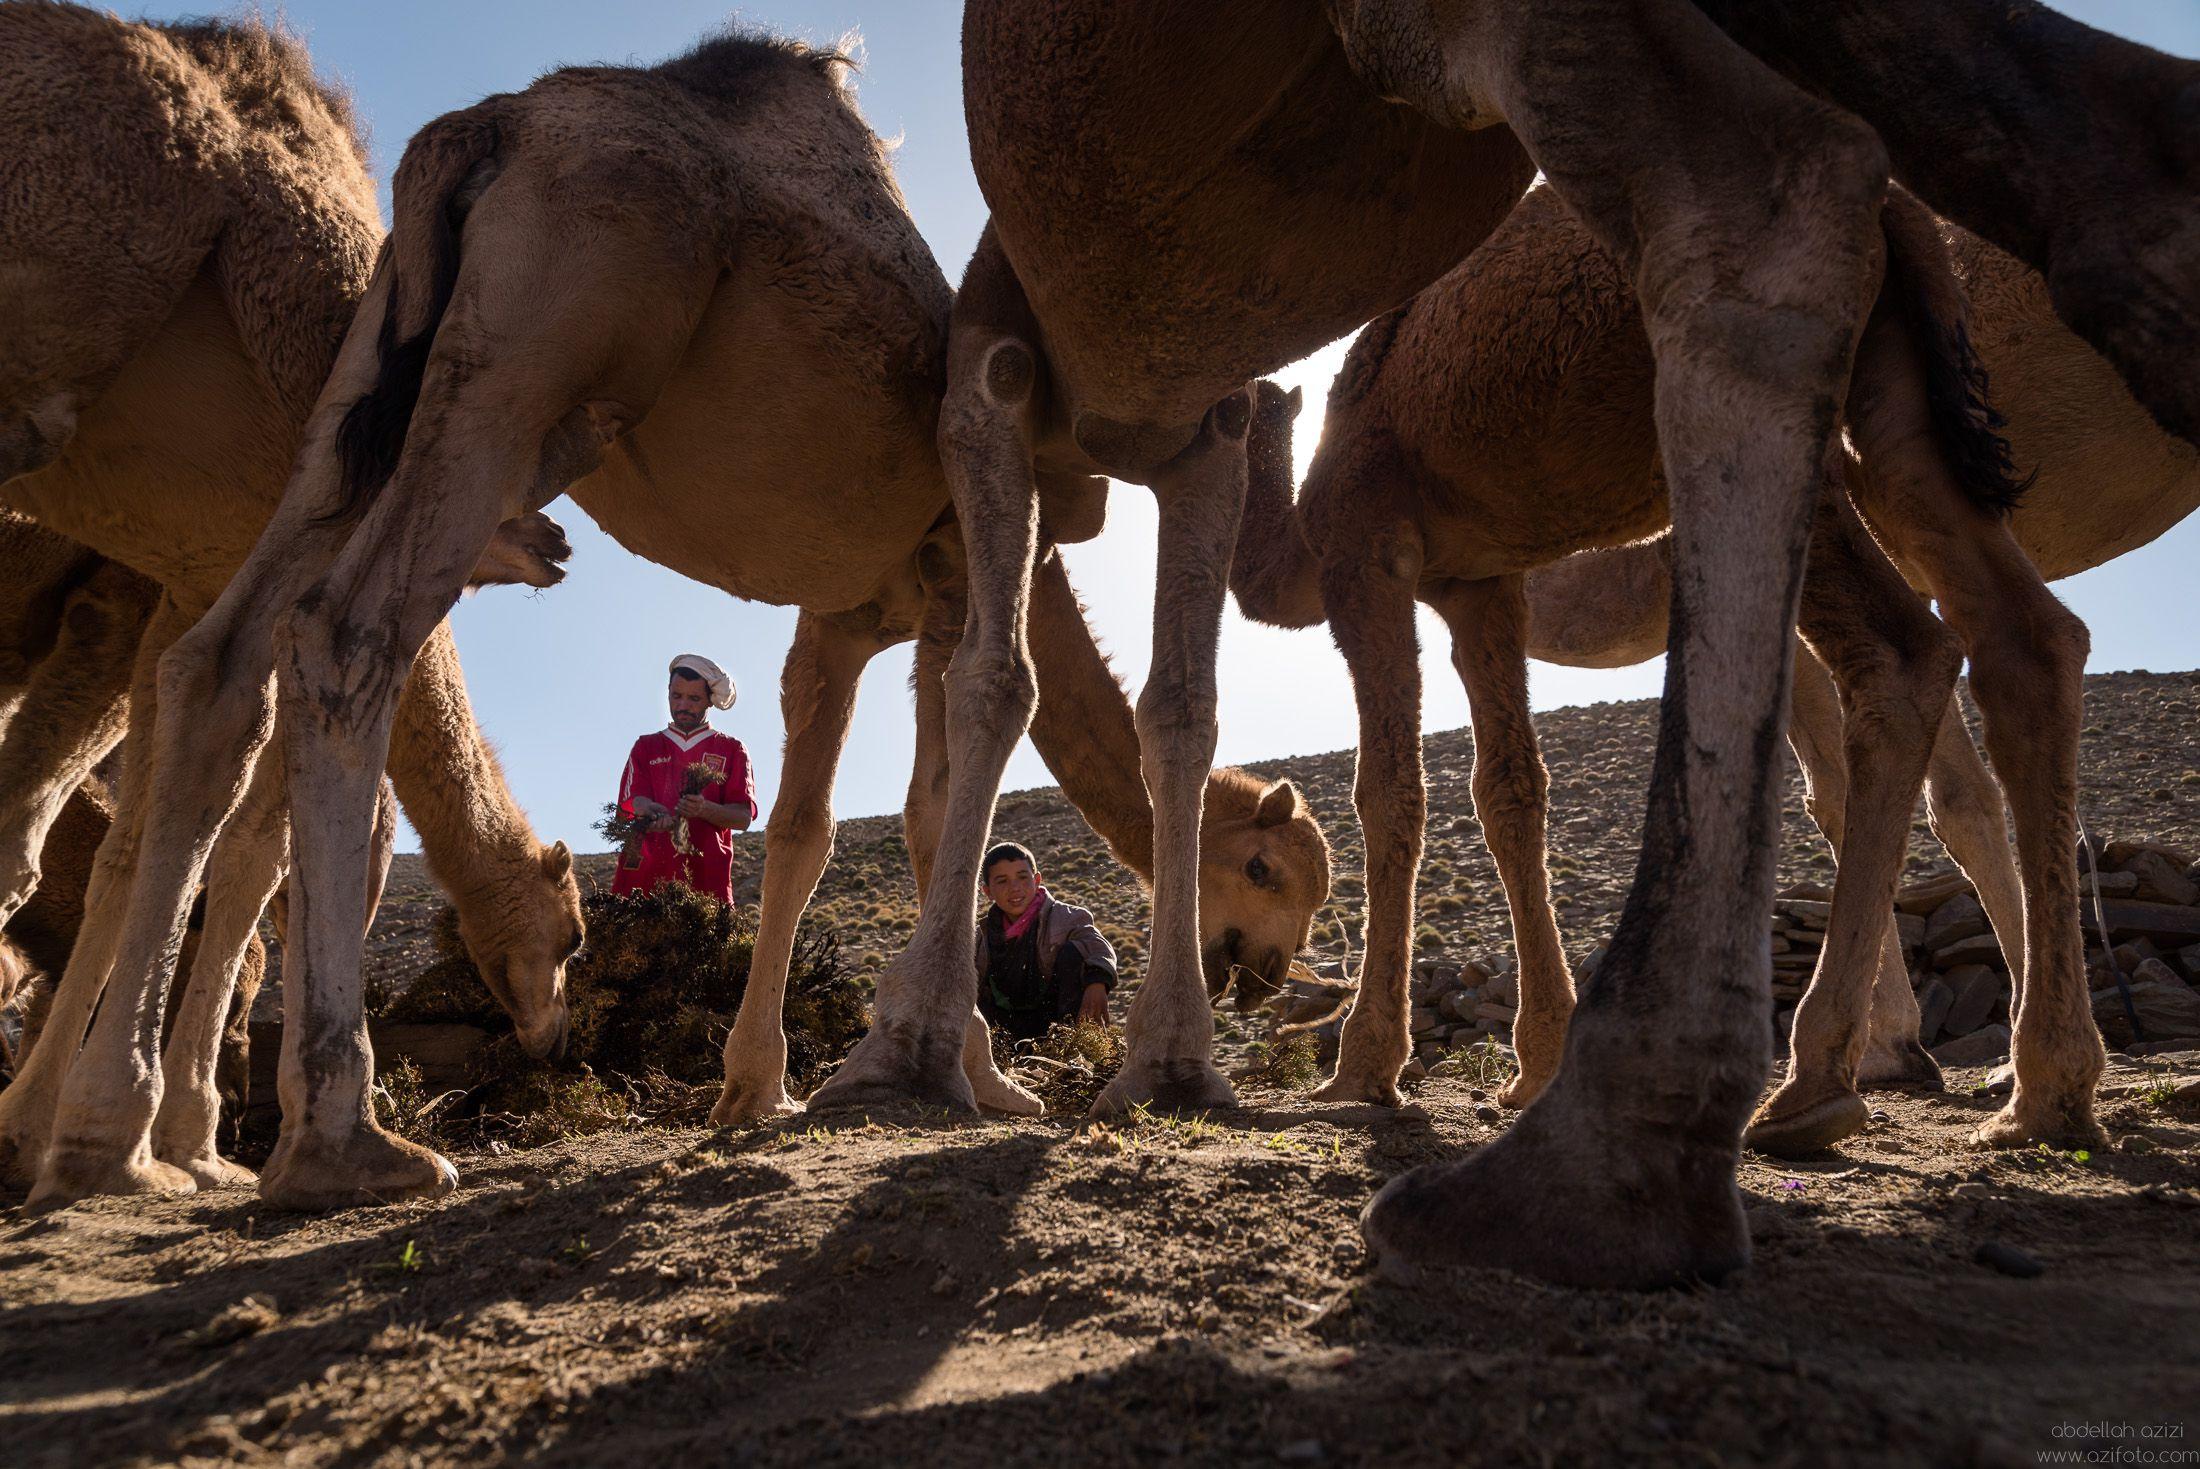 Feeding camels - Ait Atta Nomads